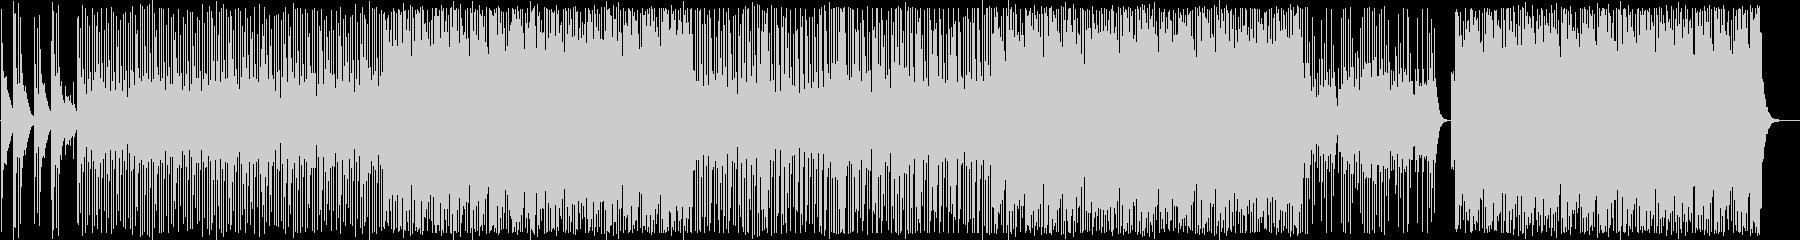 和風/和楽器(三味線・琴・太鼓)/B5の未再生の波形